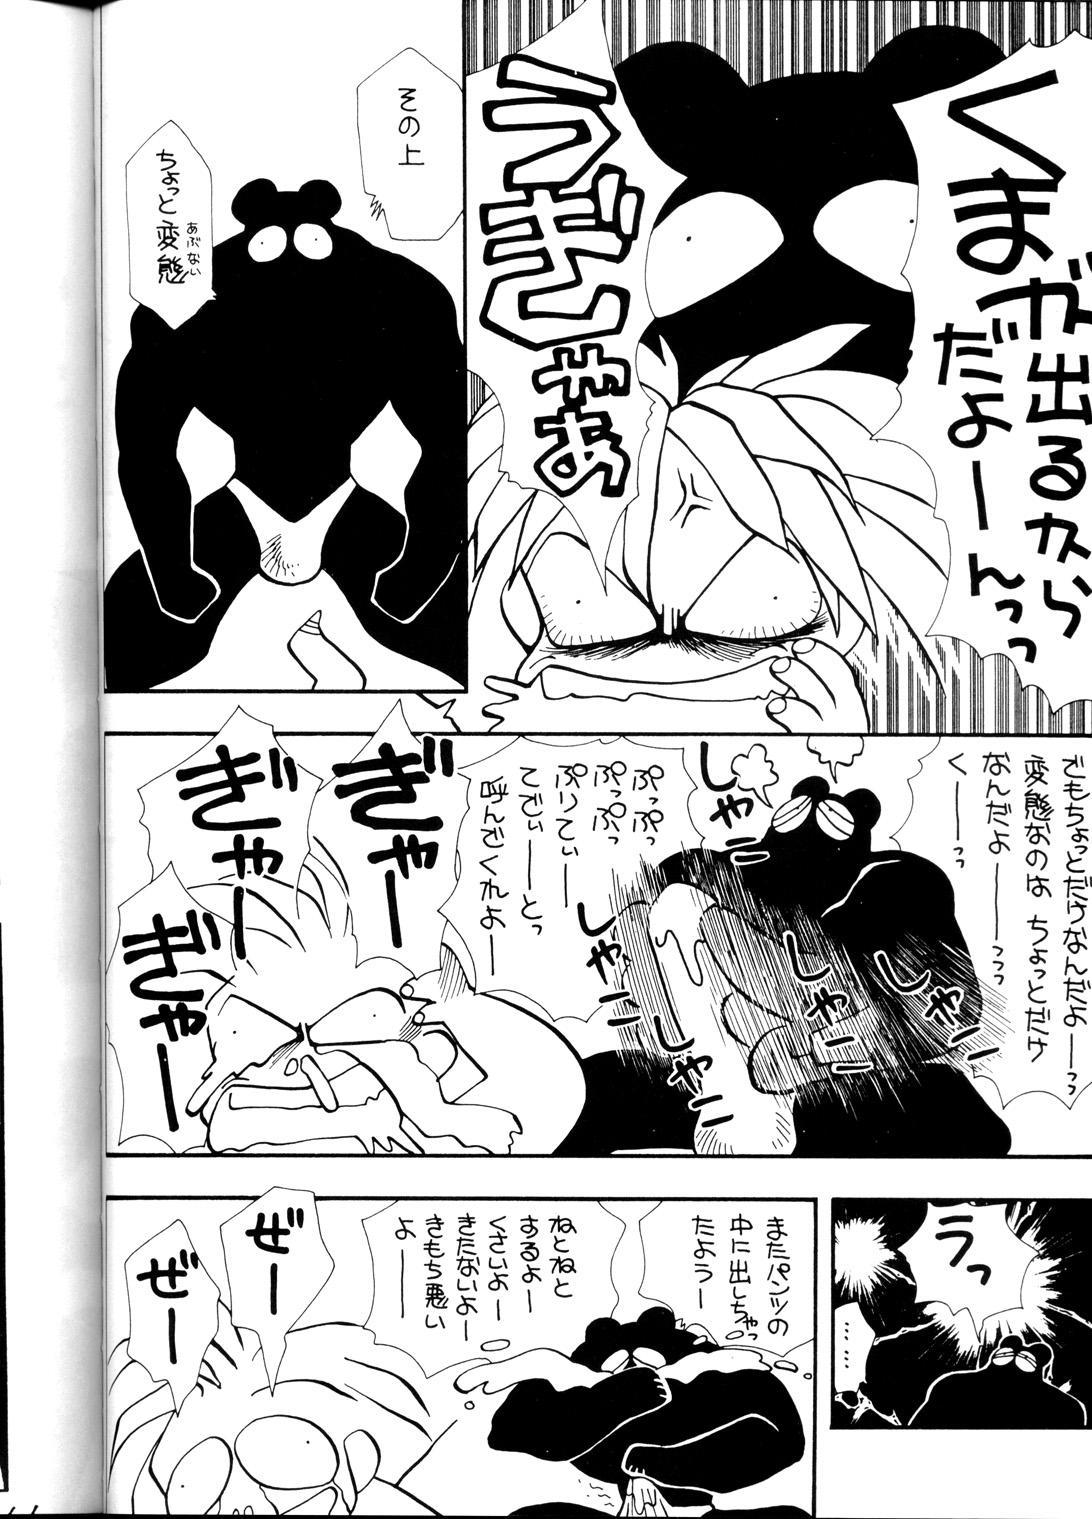 [B.B.C] Tenchi Muyou! Ryou-ou-ki Kaiteiben (Tenchi Muyou!) 60